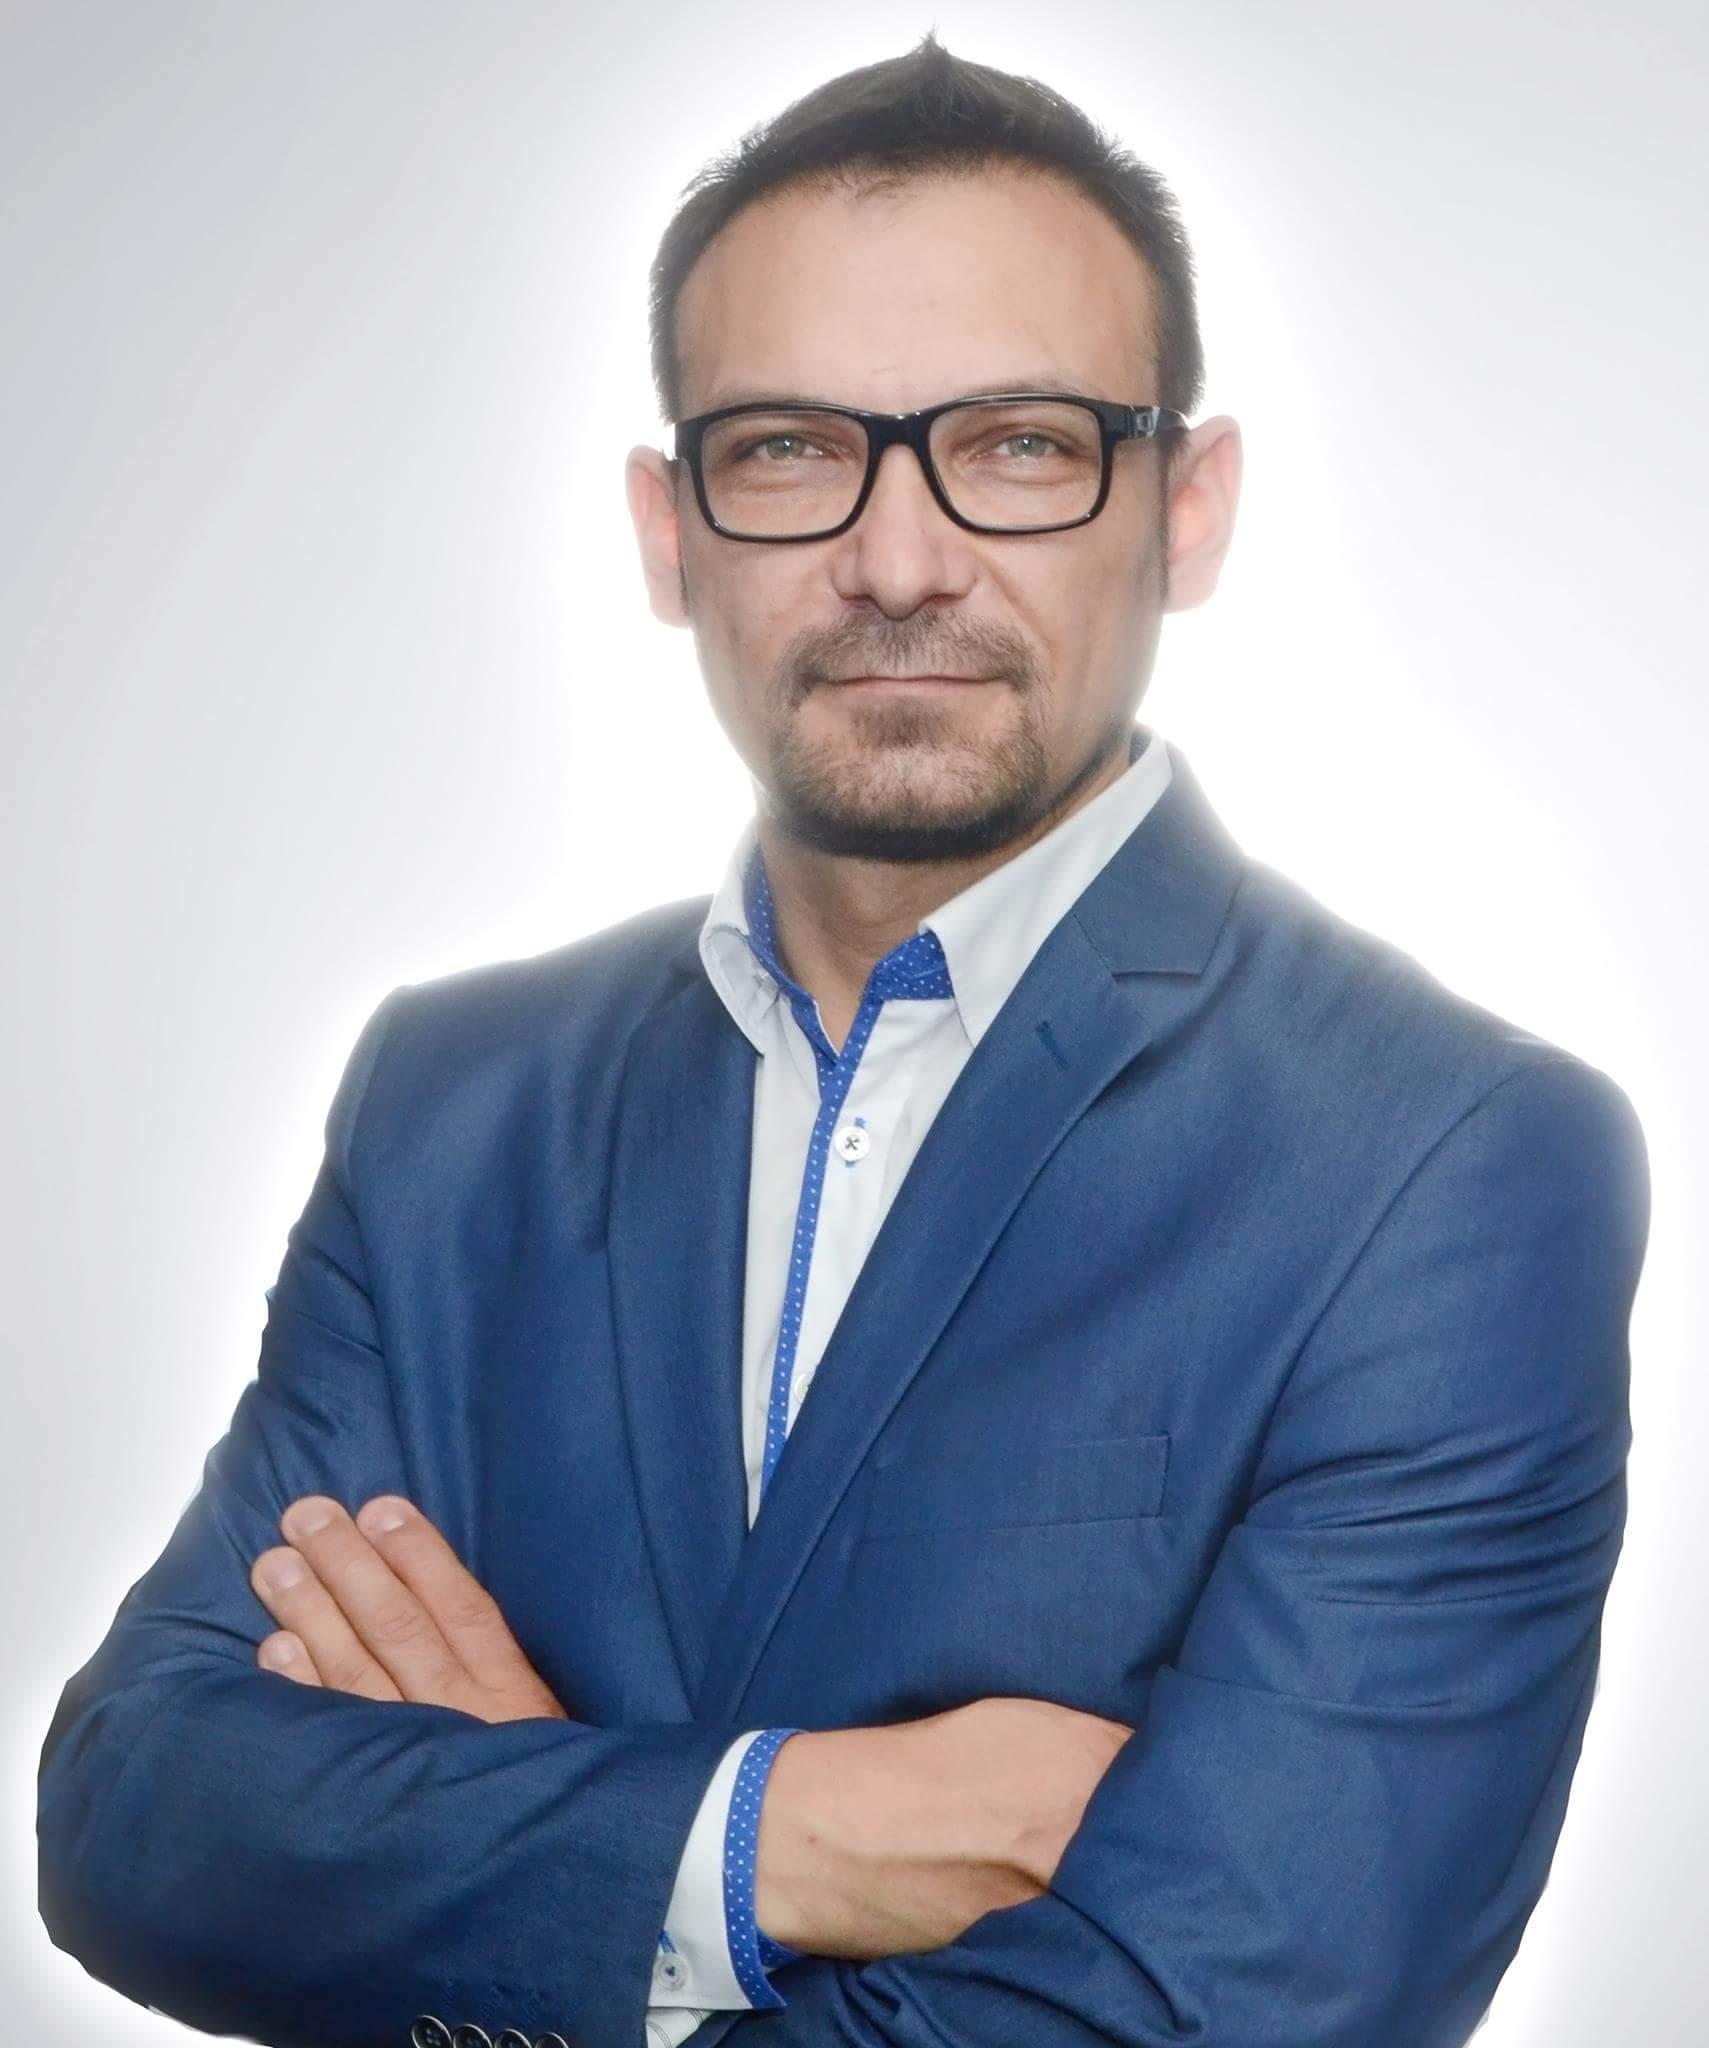 Mariusz Barański